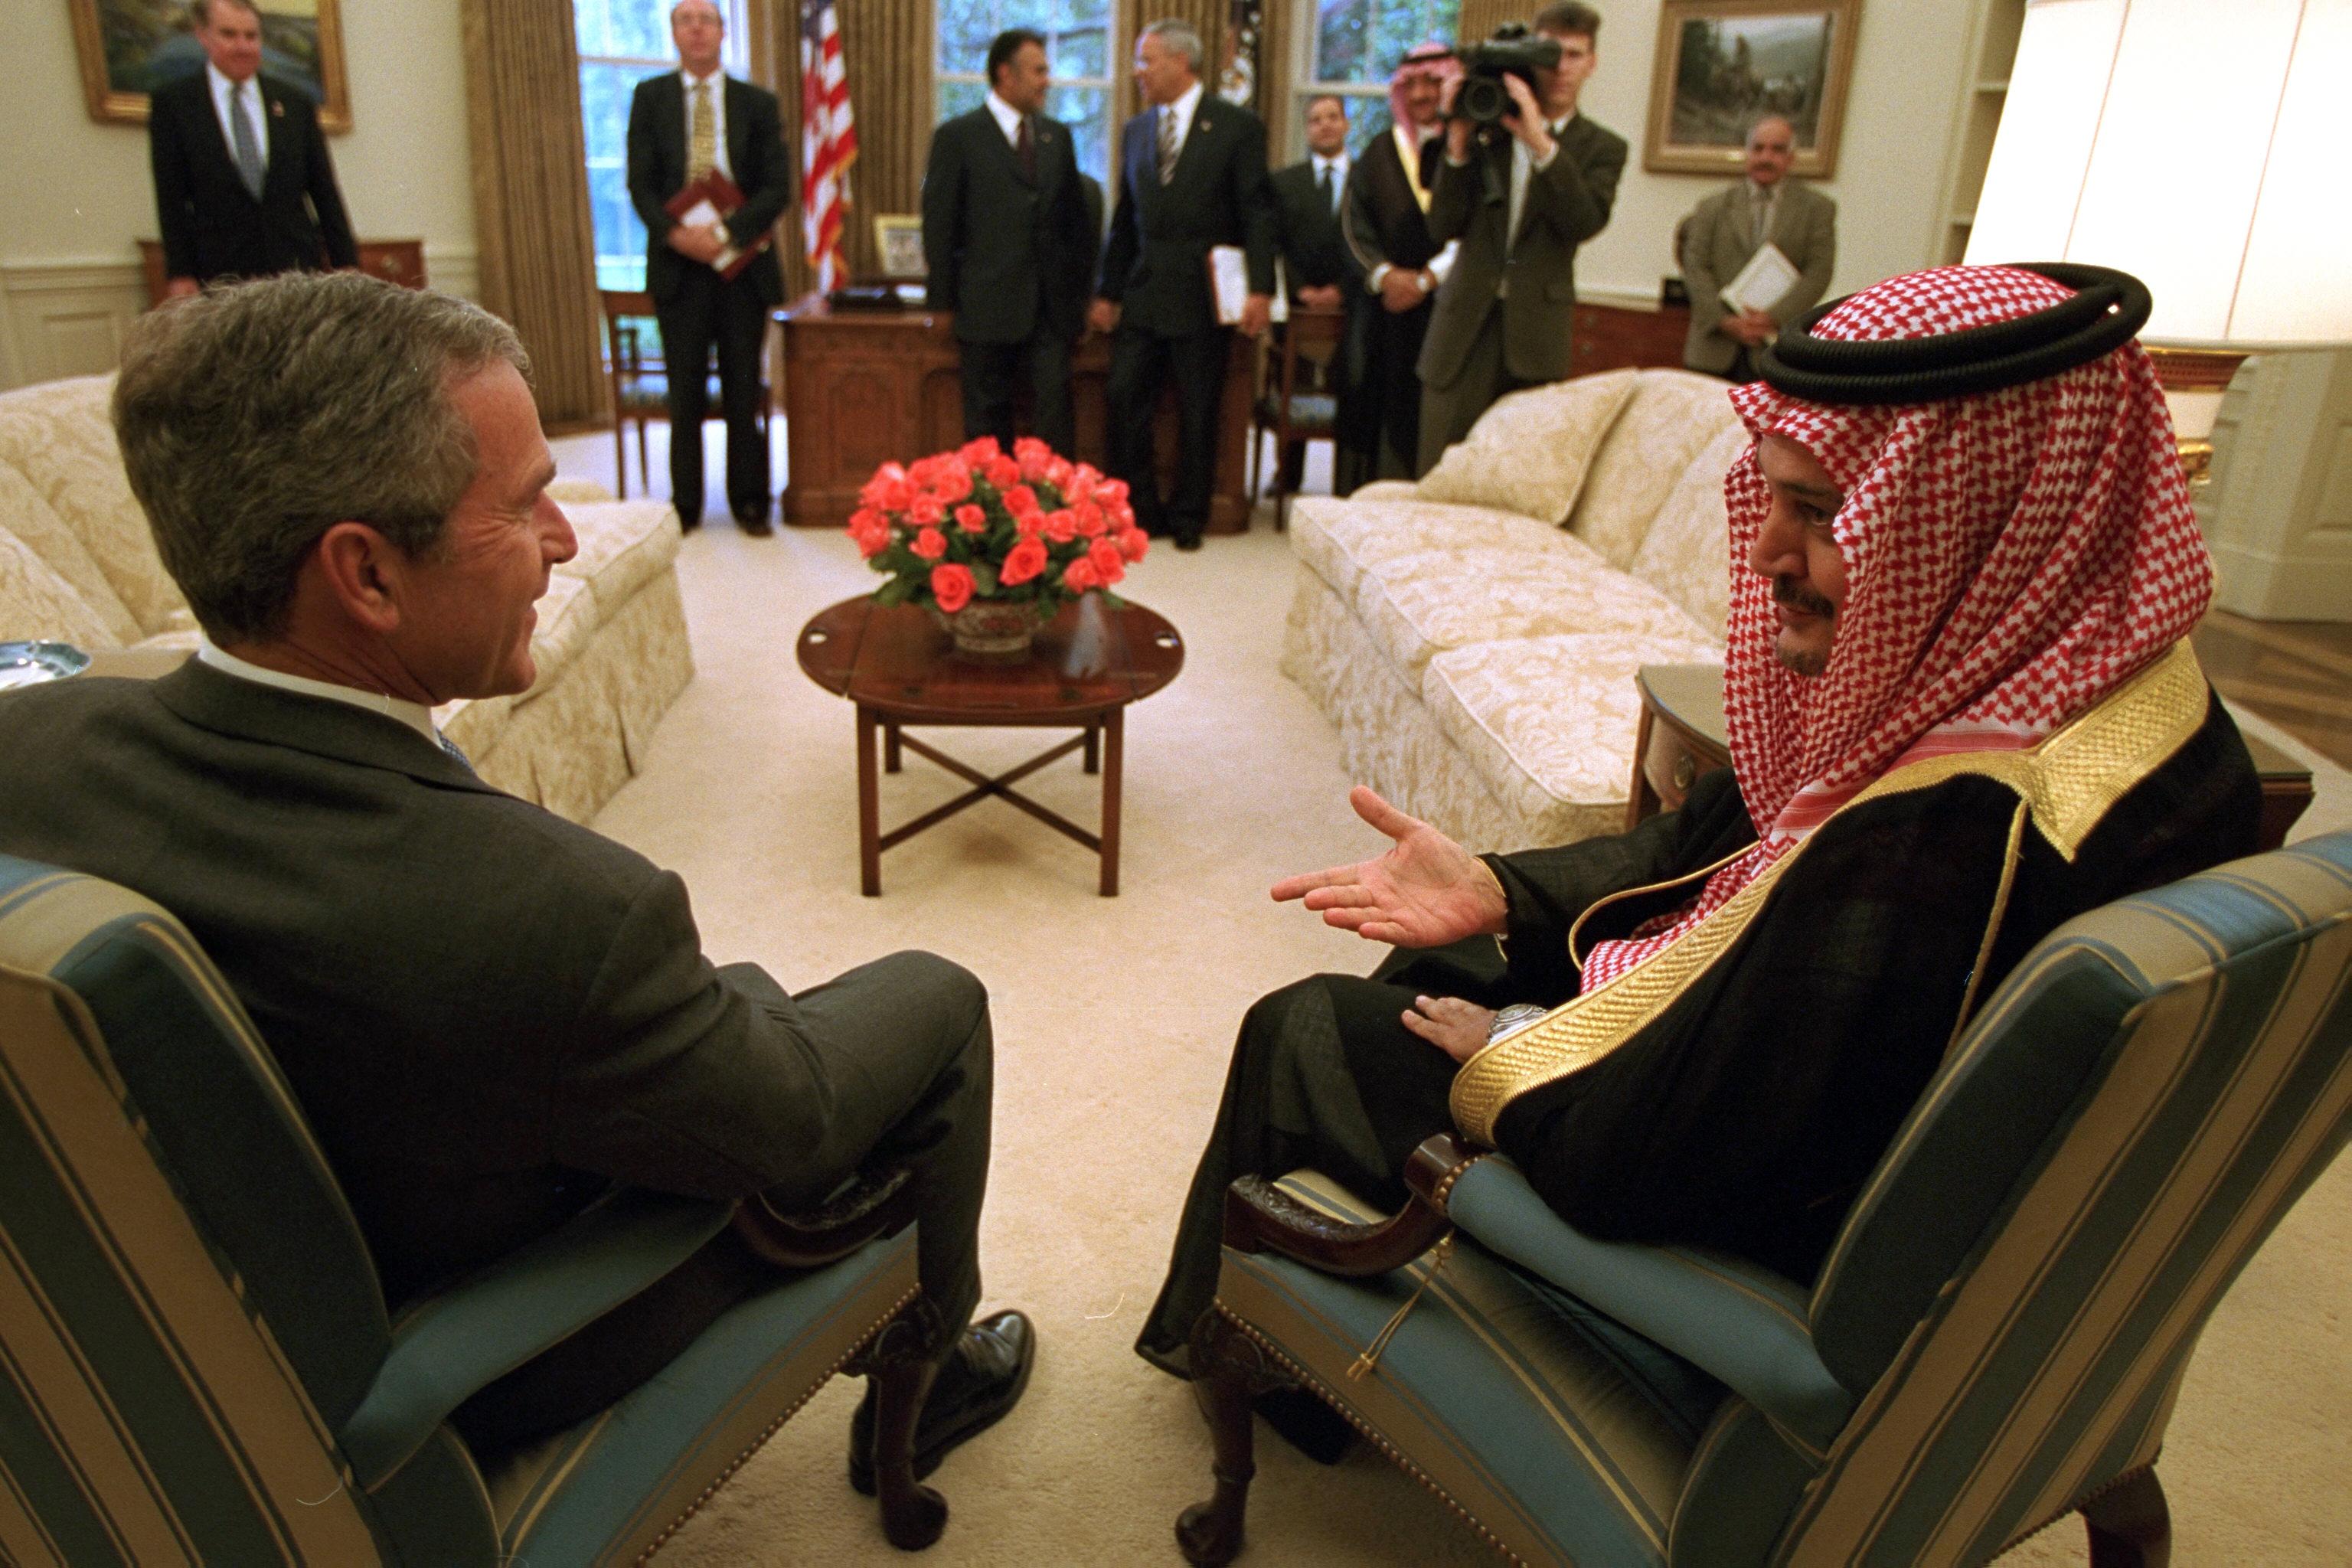 JASTA: A Tragedy of American Hypocrisy, Sovereign Immunity, and International Relations